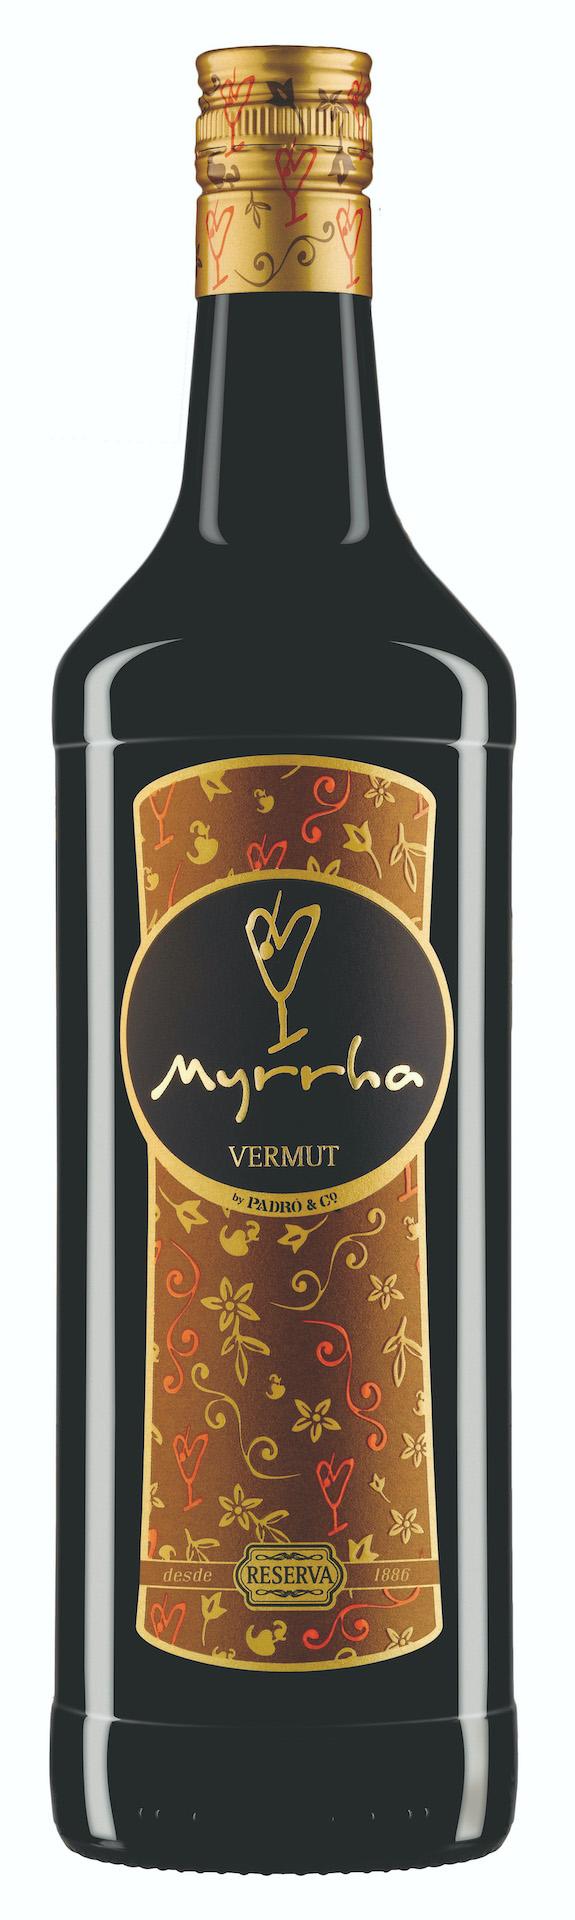 Myrrha Rojo Reserva | Padró & Co.  - Winexfood